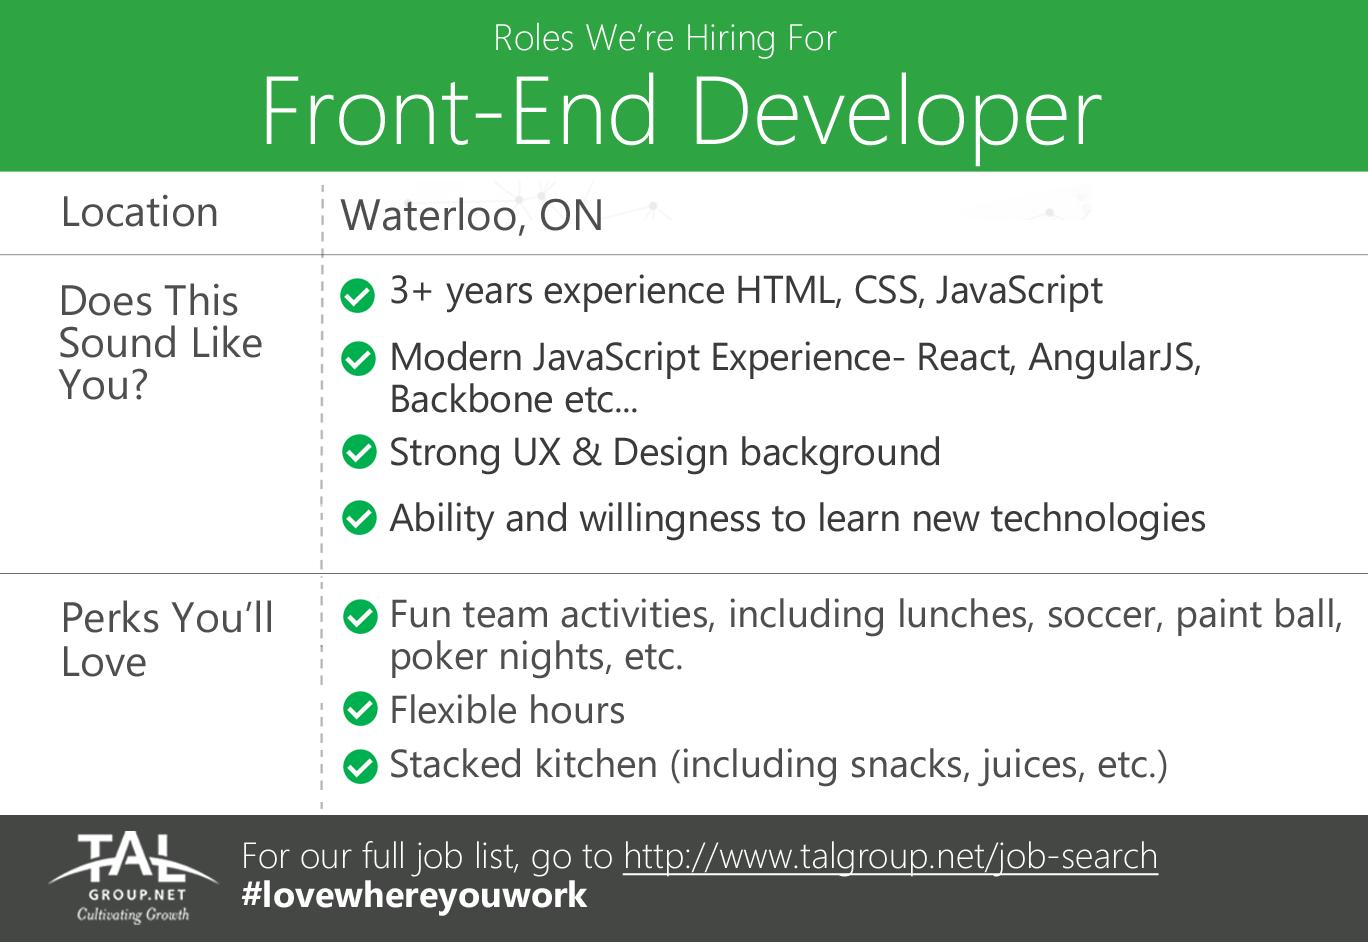 Hiring a FrontEnd Developer (Fulltime) in Waterloo, ON